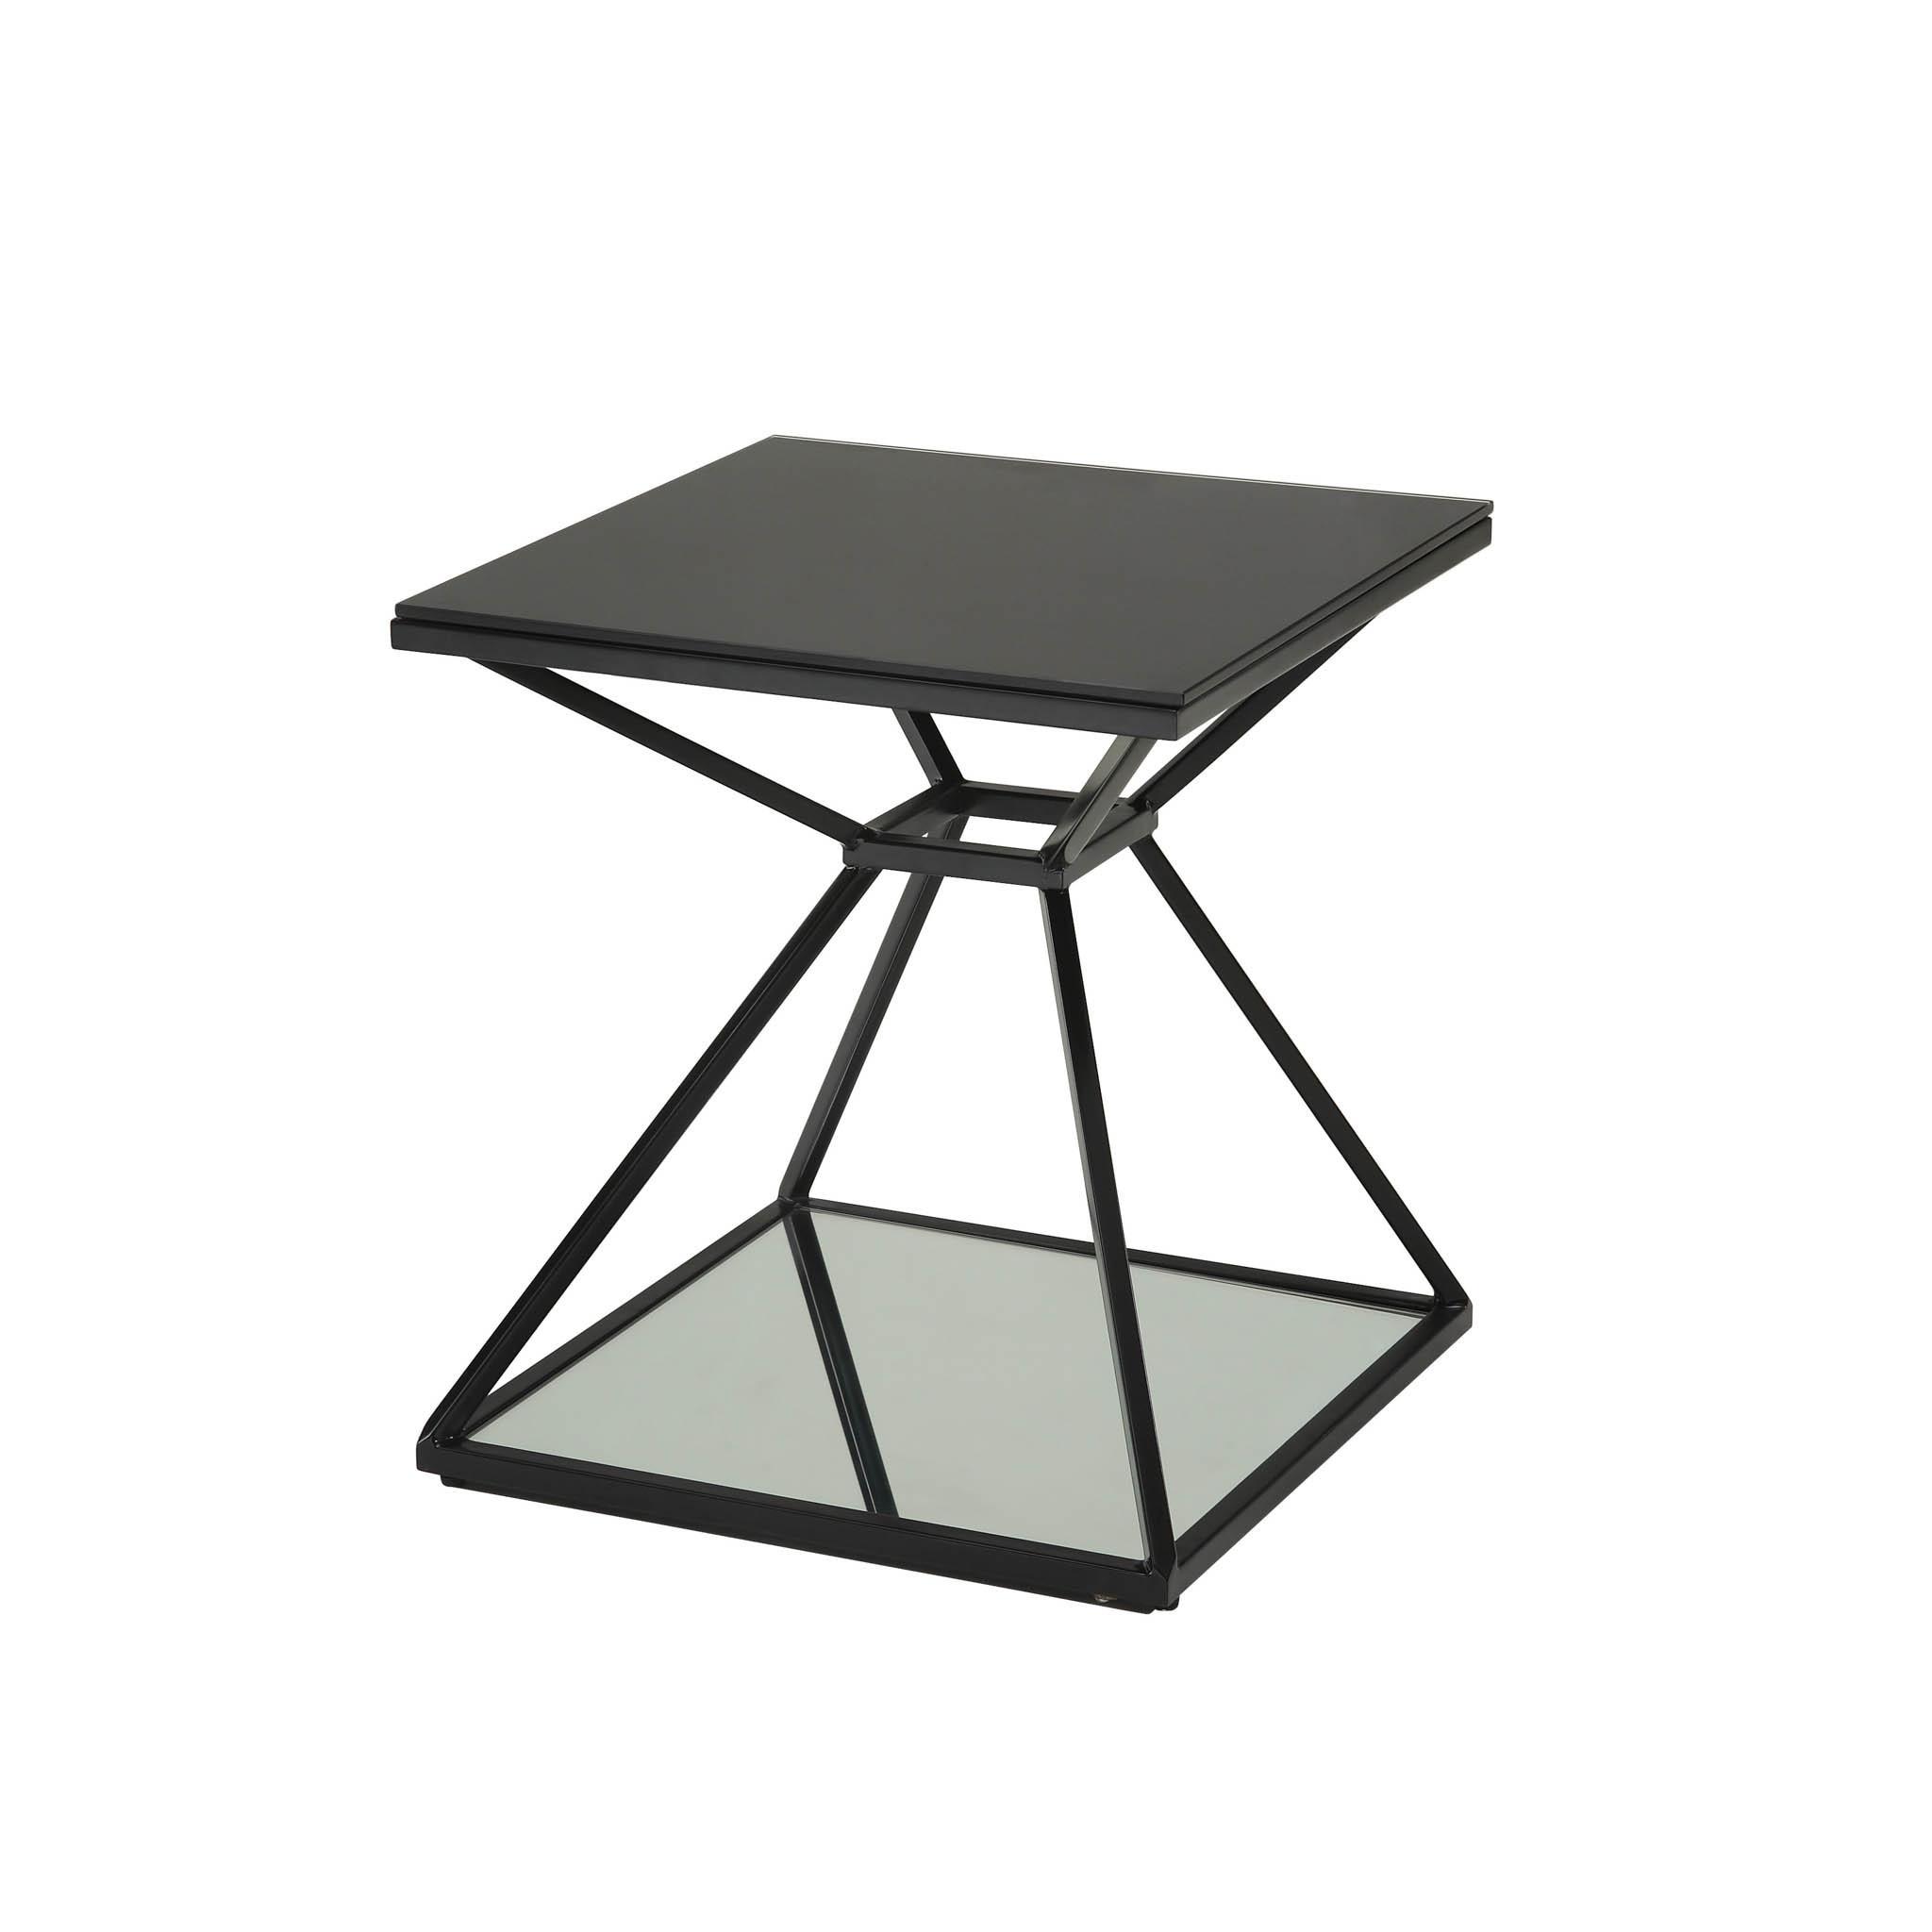 Amazing Sunpan Wedge End Table Creativecarmelina Interior Chair Design Creativecarmelinacom